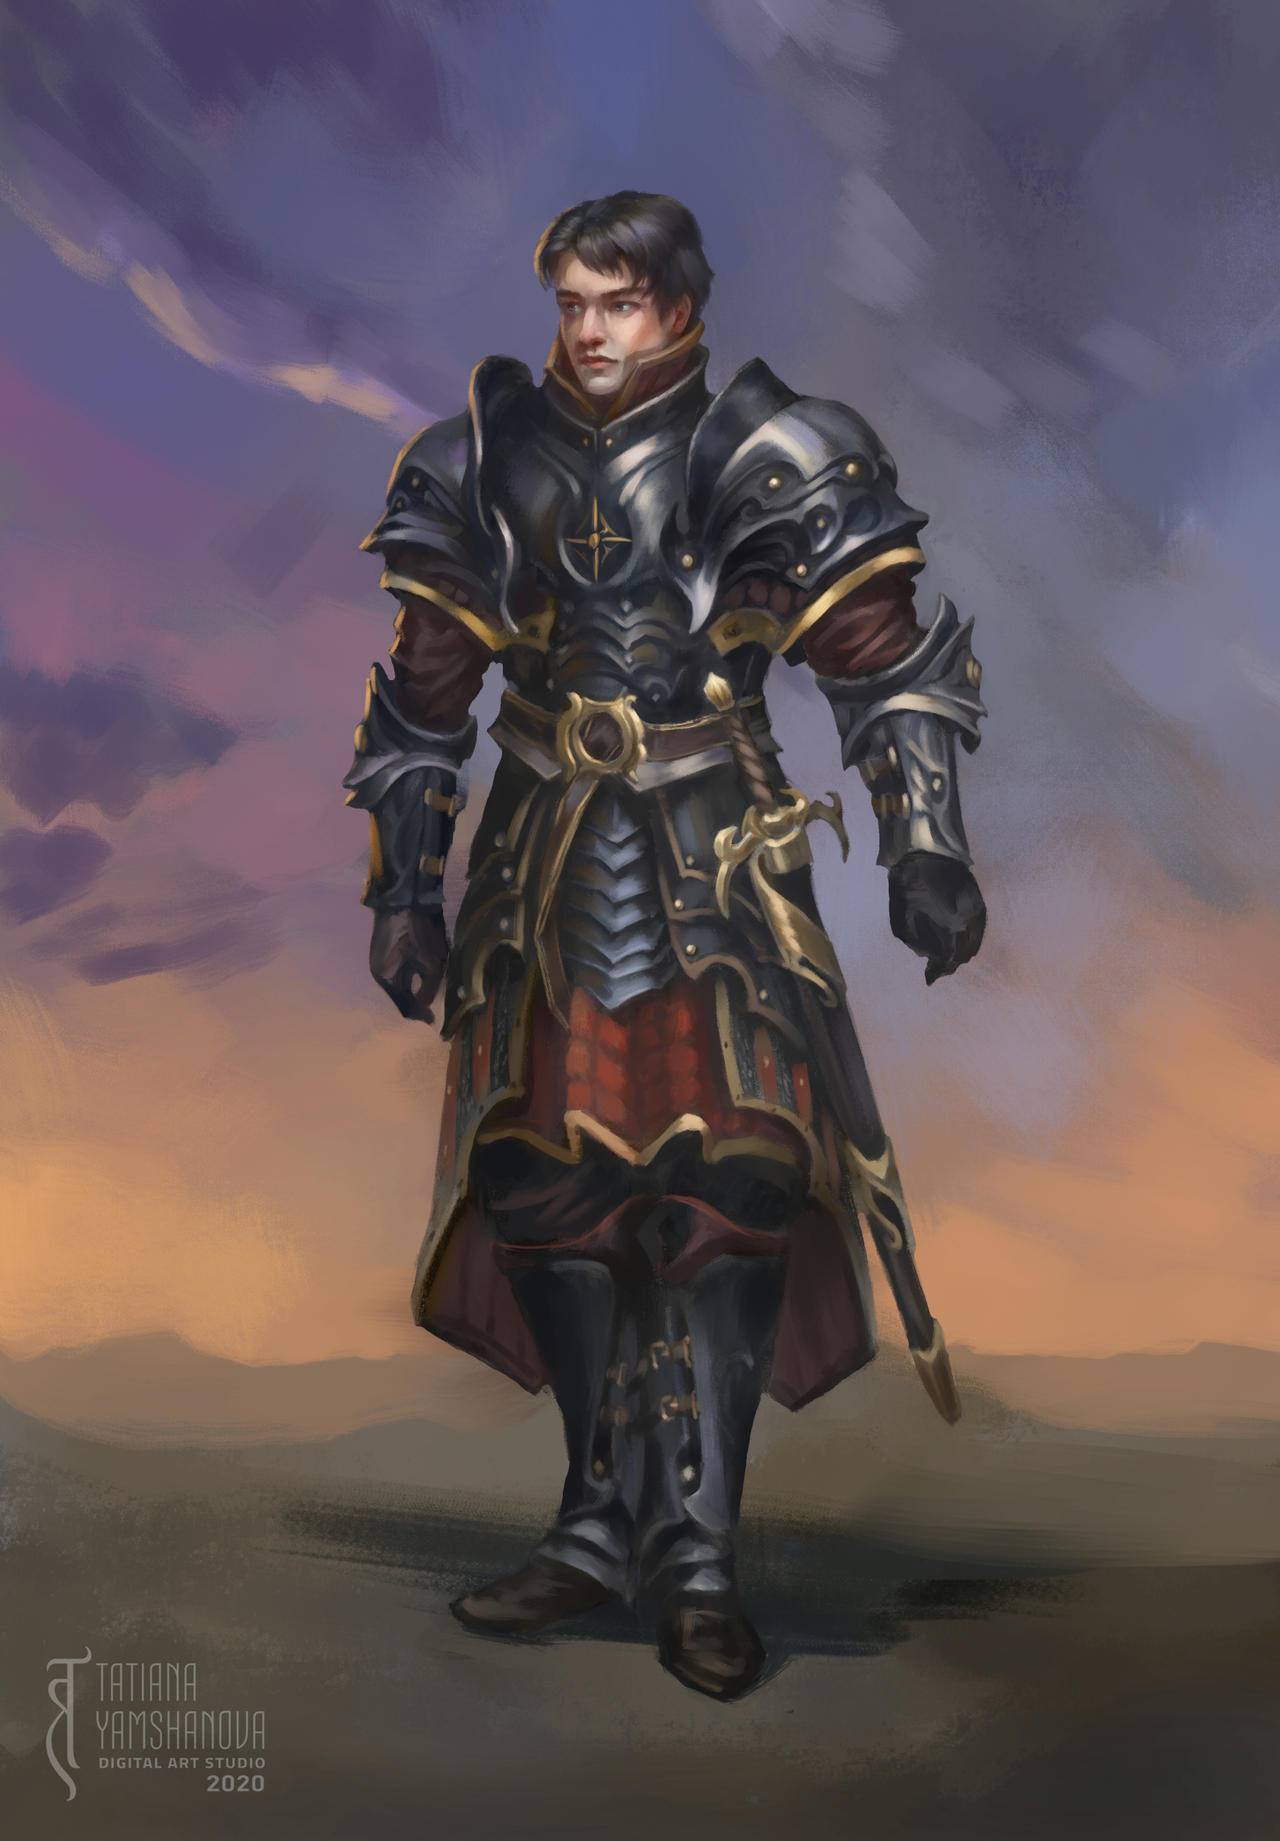 Cahir armor design, character illustration